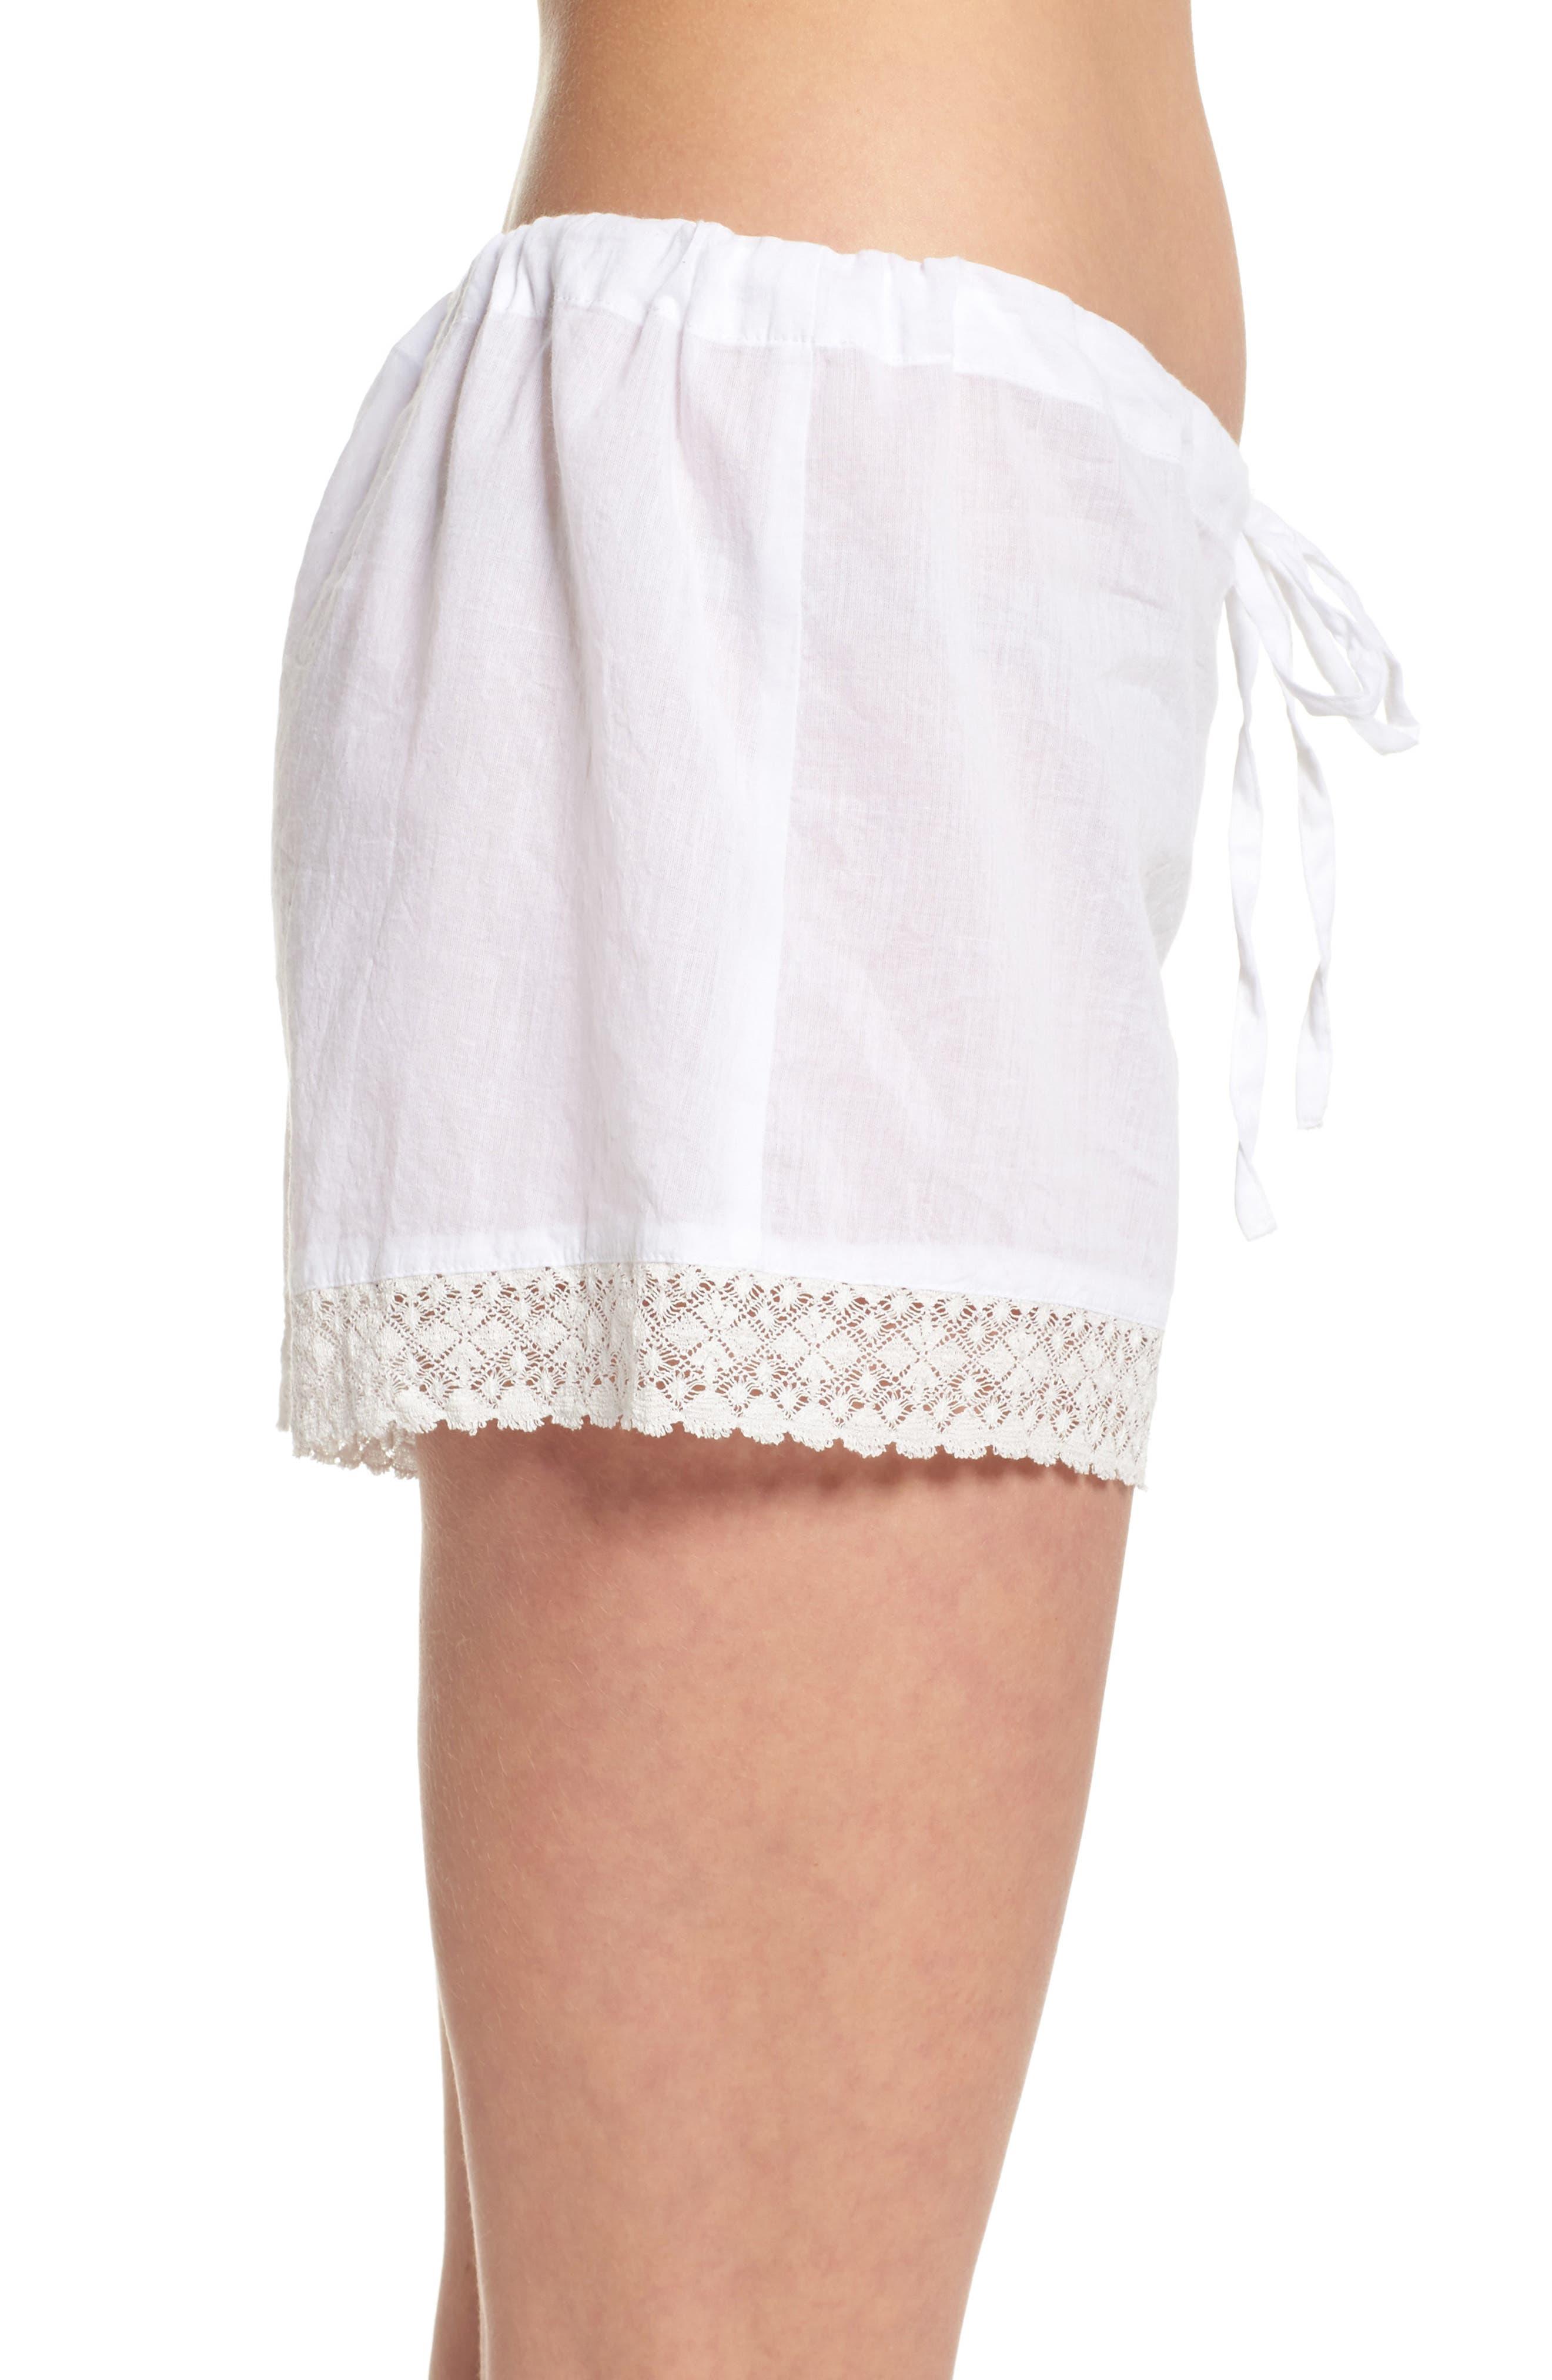 Lace Trim Sleep Shorts,                             Alternate thumbnail 3, color,                             White